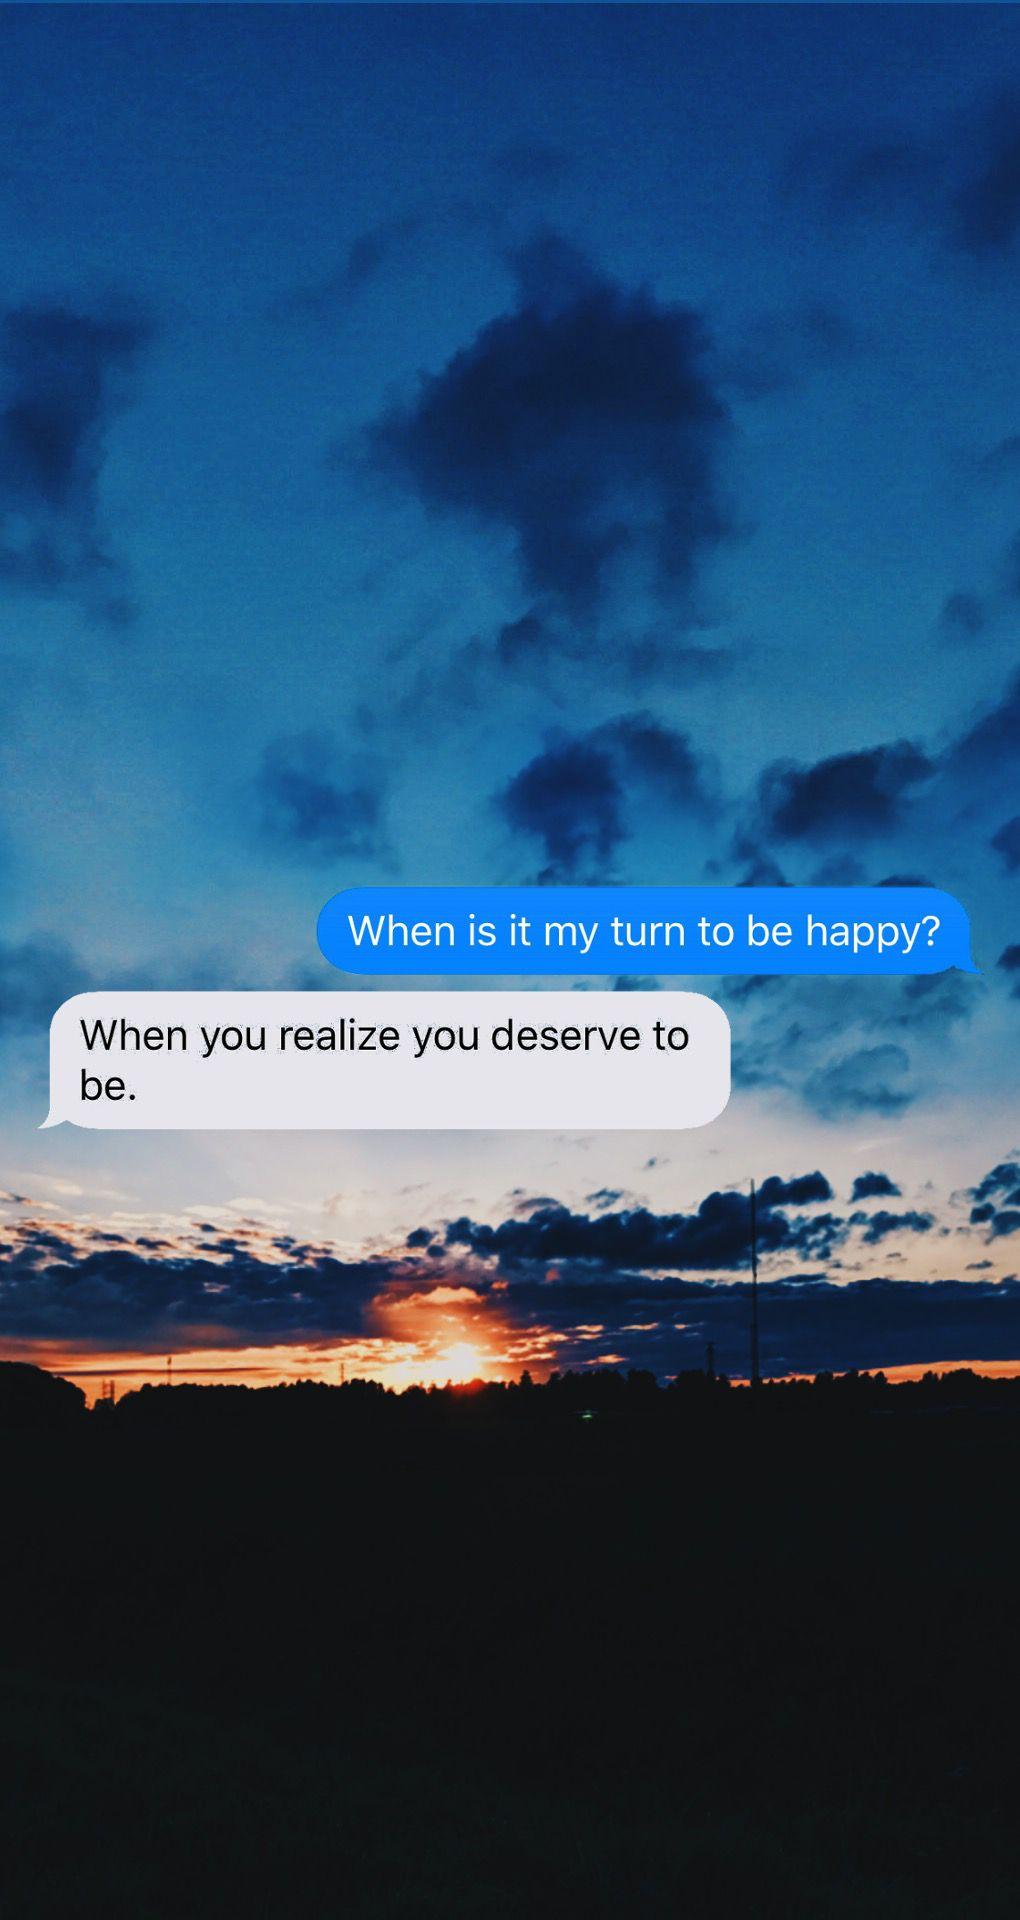 iphone message wallpaper,sky,cloud,natural landscape,text,horizon